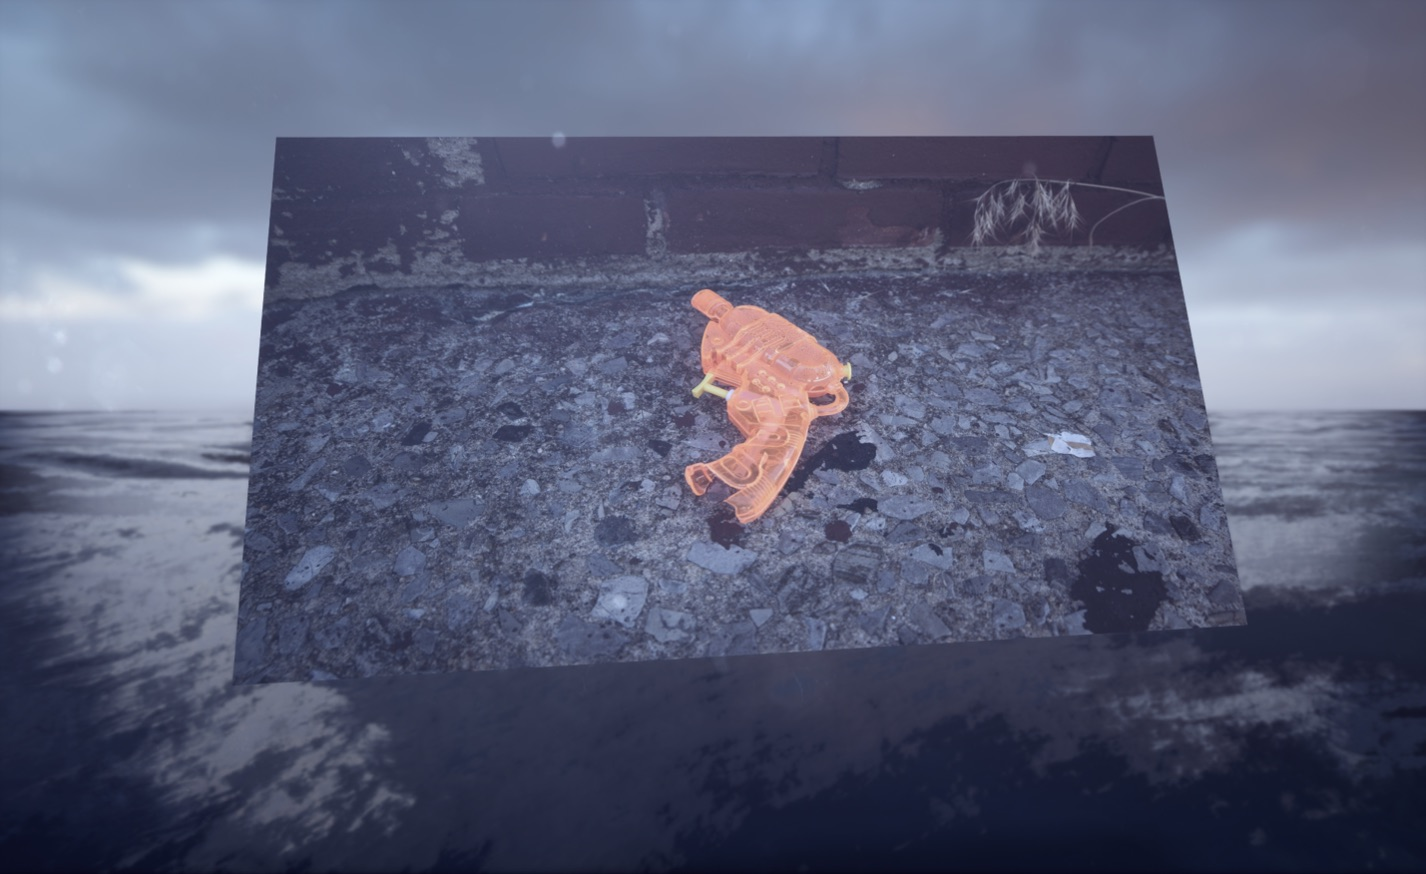 Jakob Kudsk Steensen (DK/US) Aquaphobia, 2017, virtual reality installation